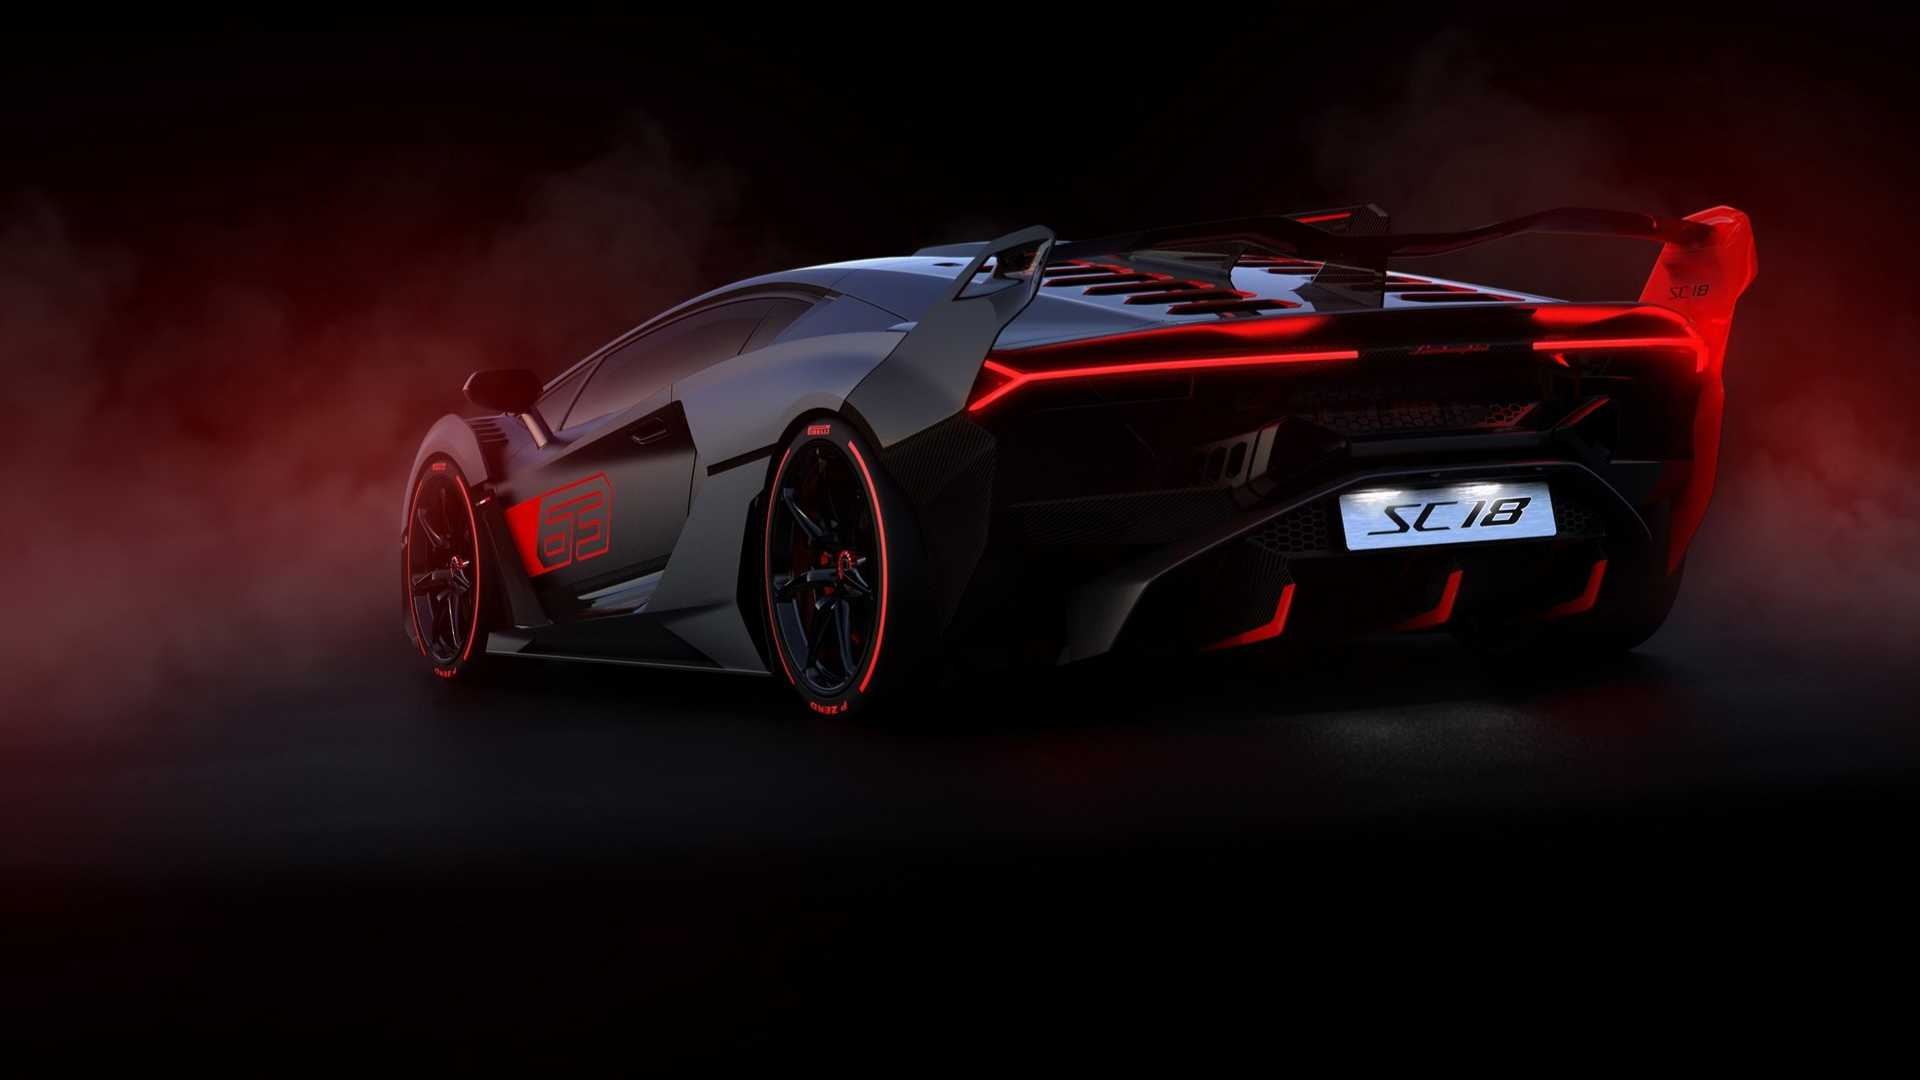 2019 Lamborghini SC18 Alston Rear Three-Quarter Wallpapers (12)